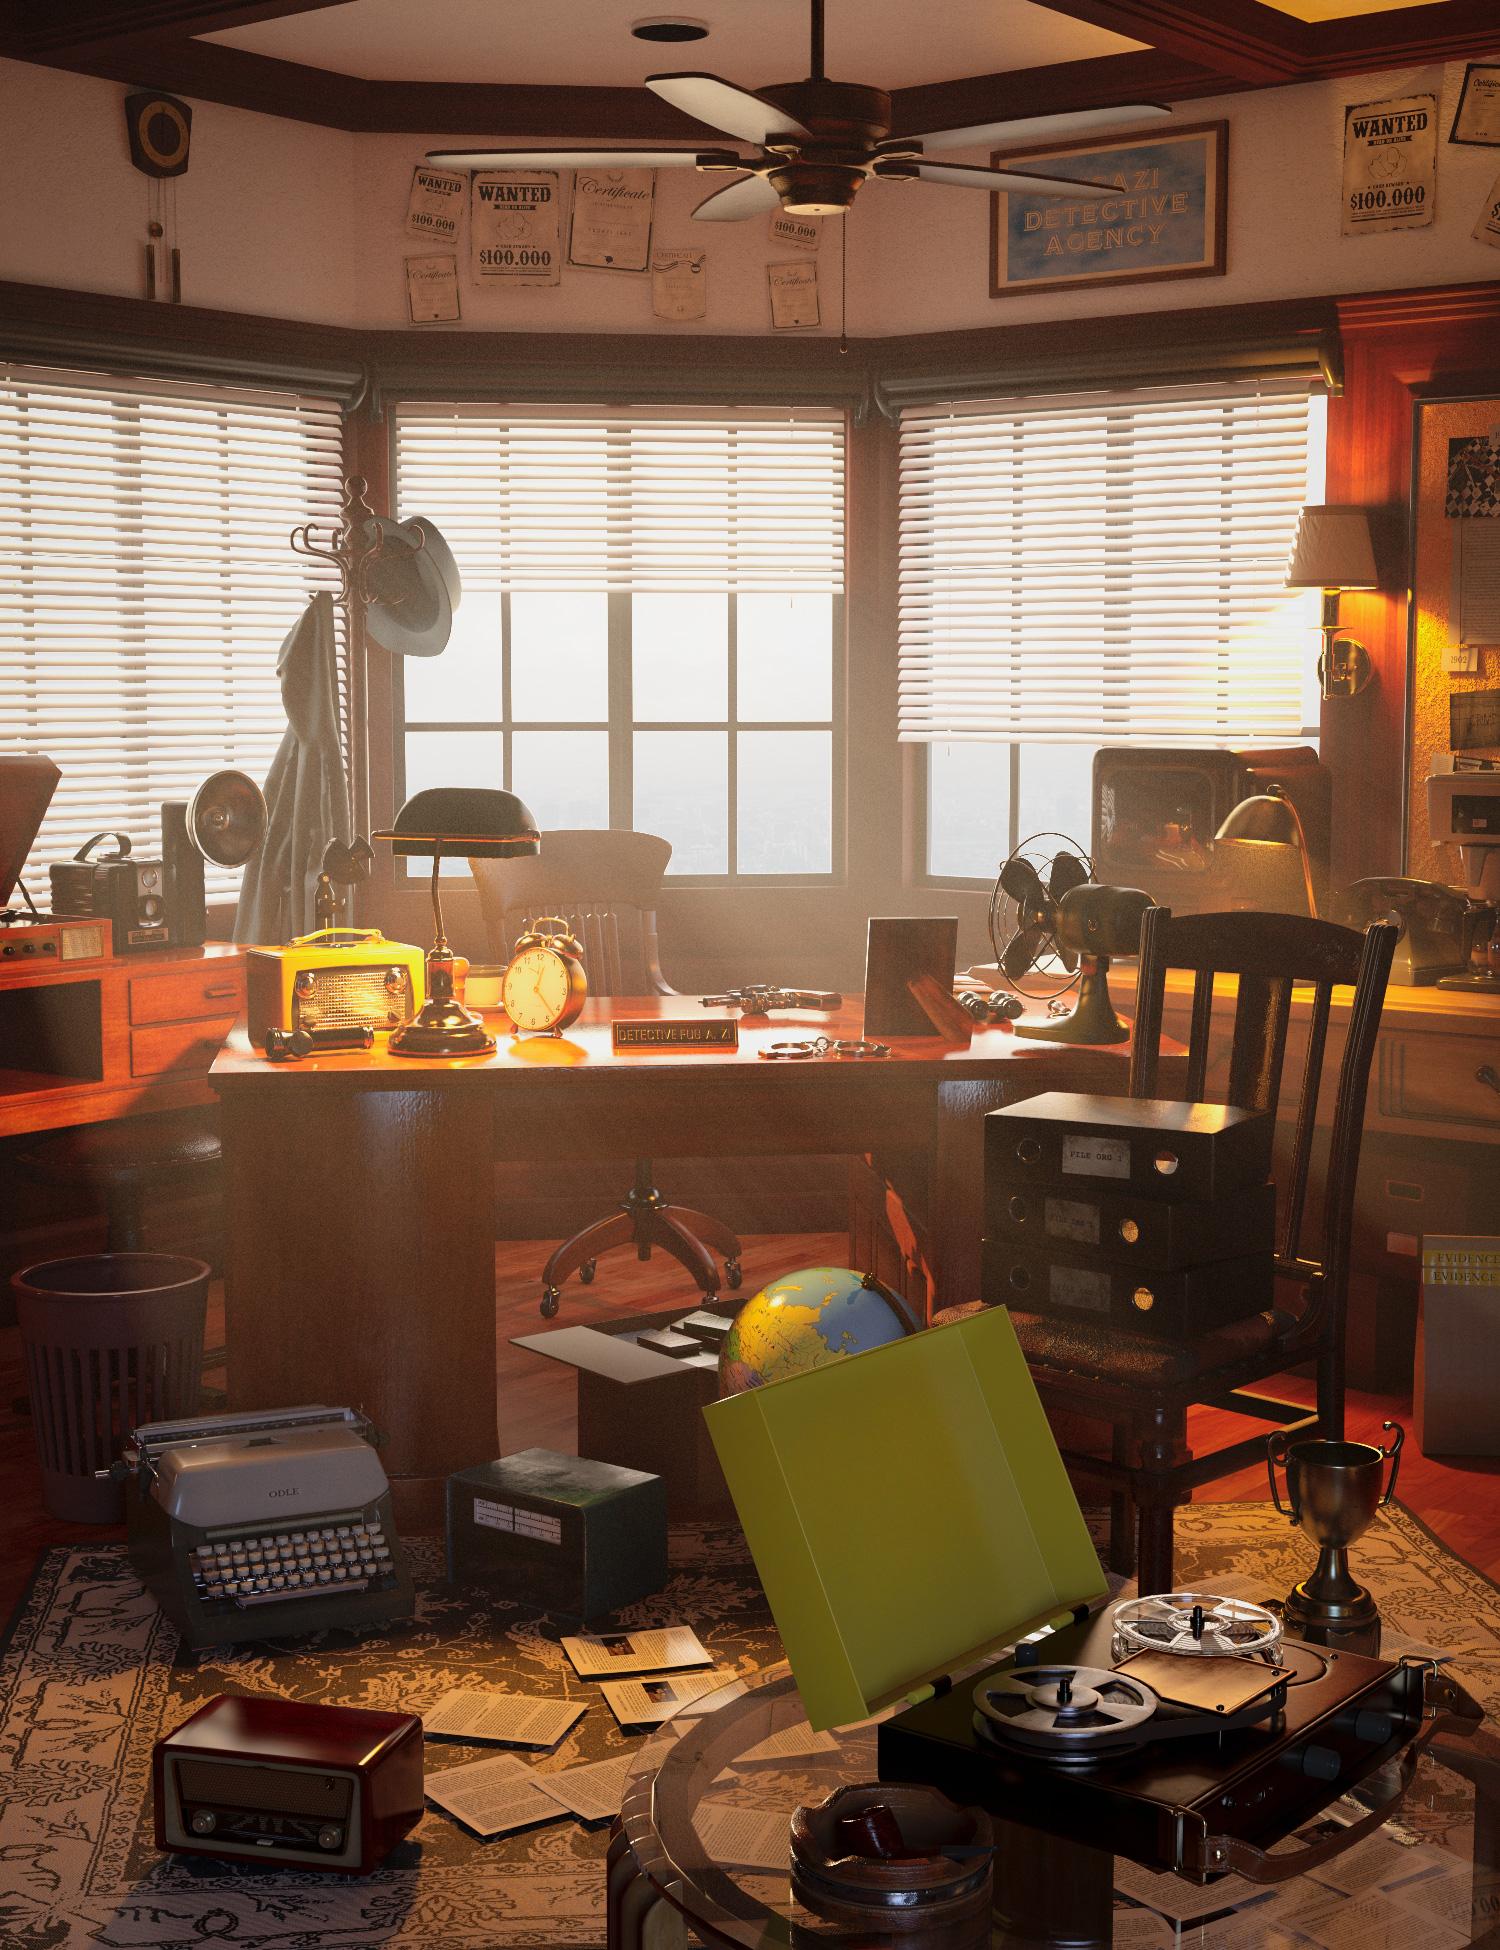 FG Detective Room by: Fugazi1968Ironman, 3D Models by Daz 3D